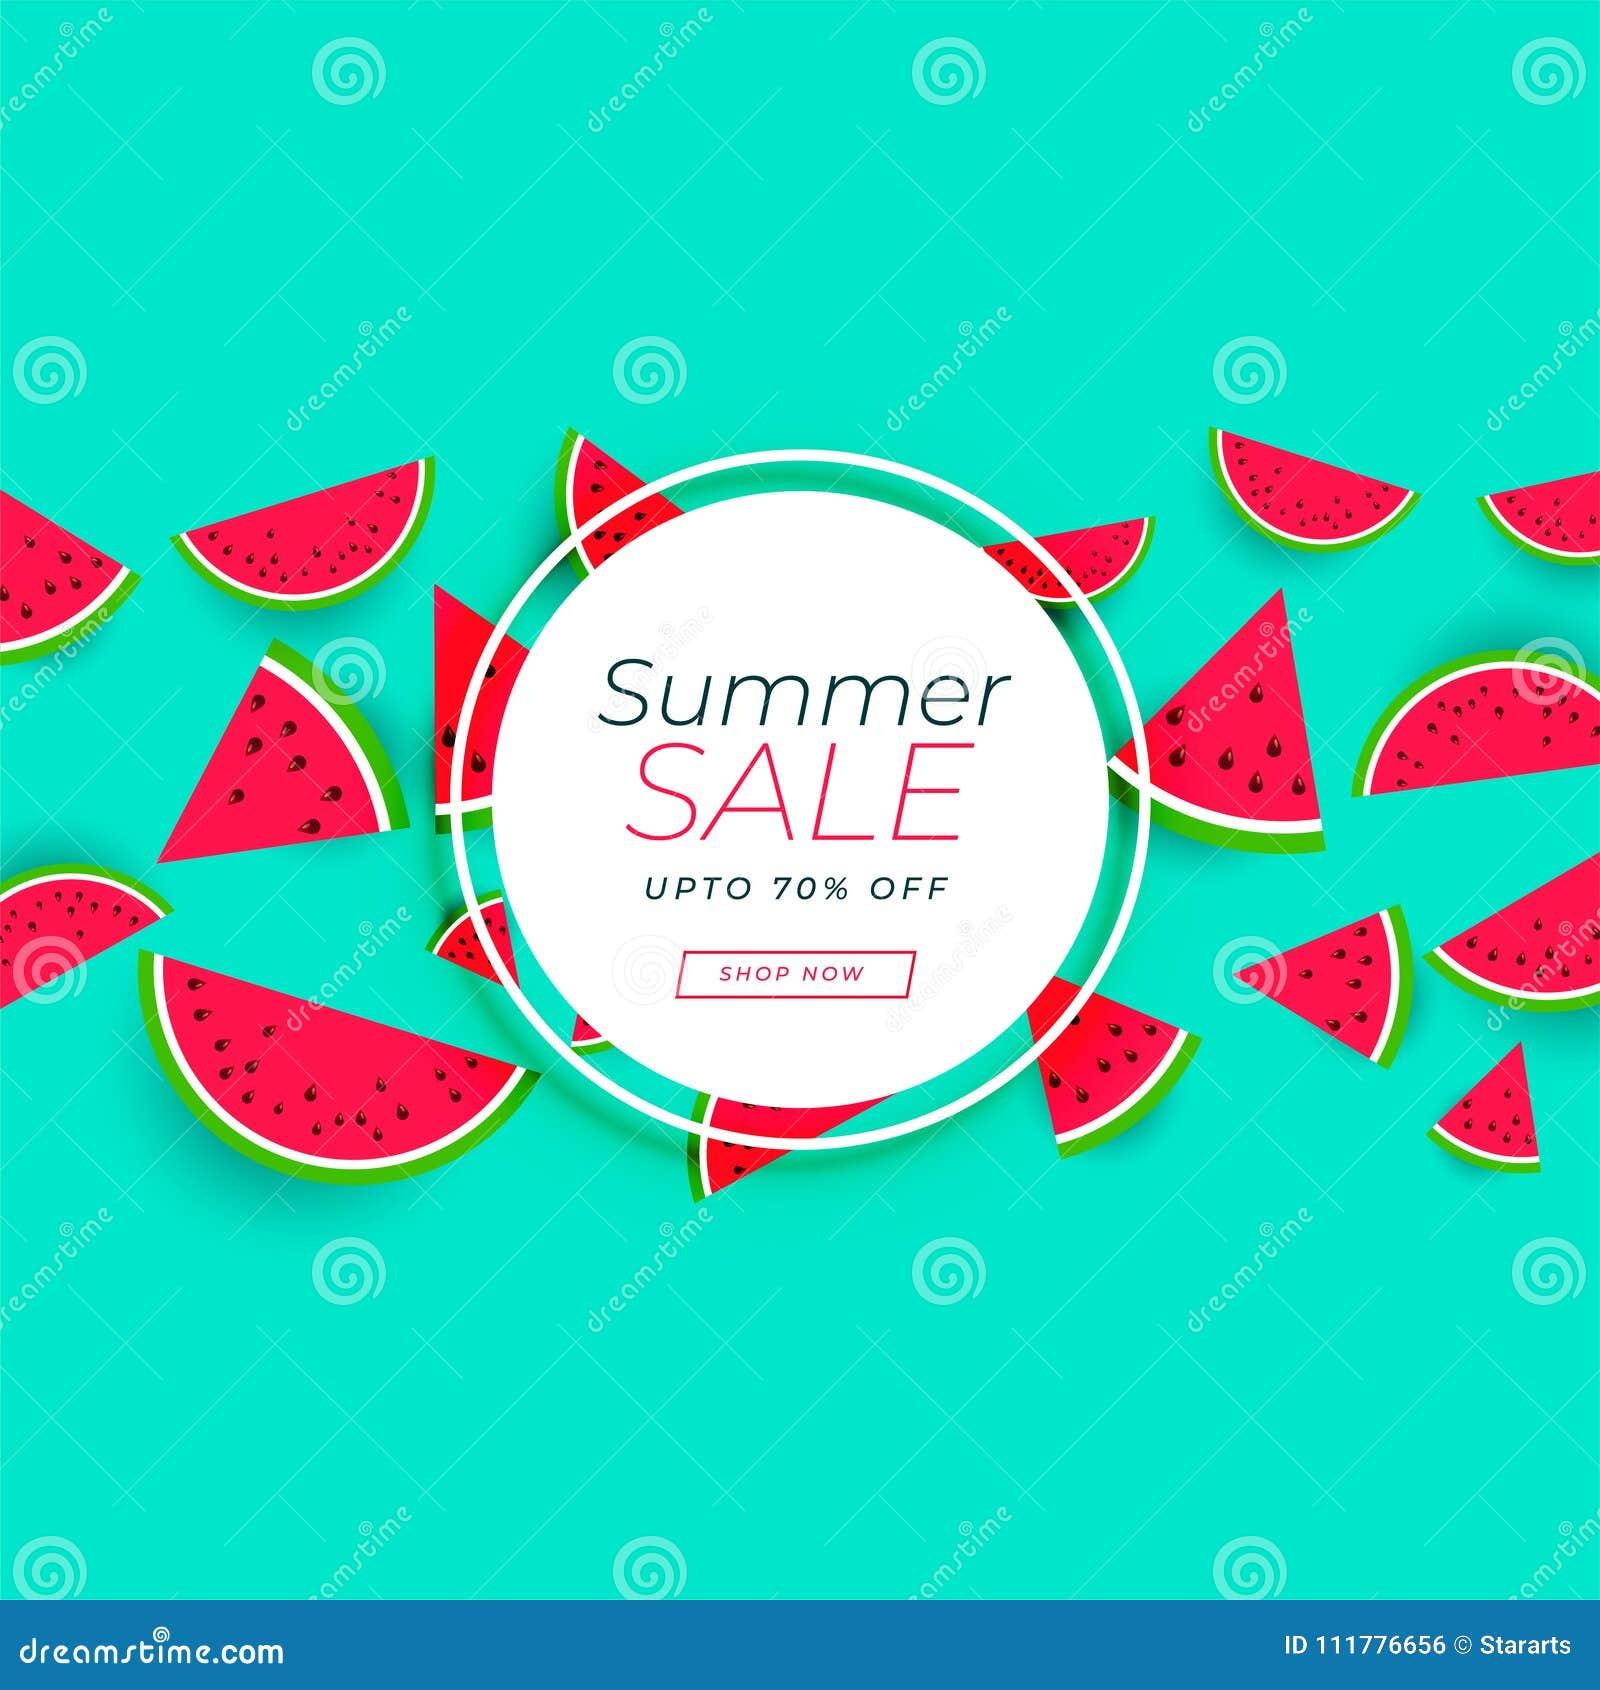 Summer sale banner with watermelon background